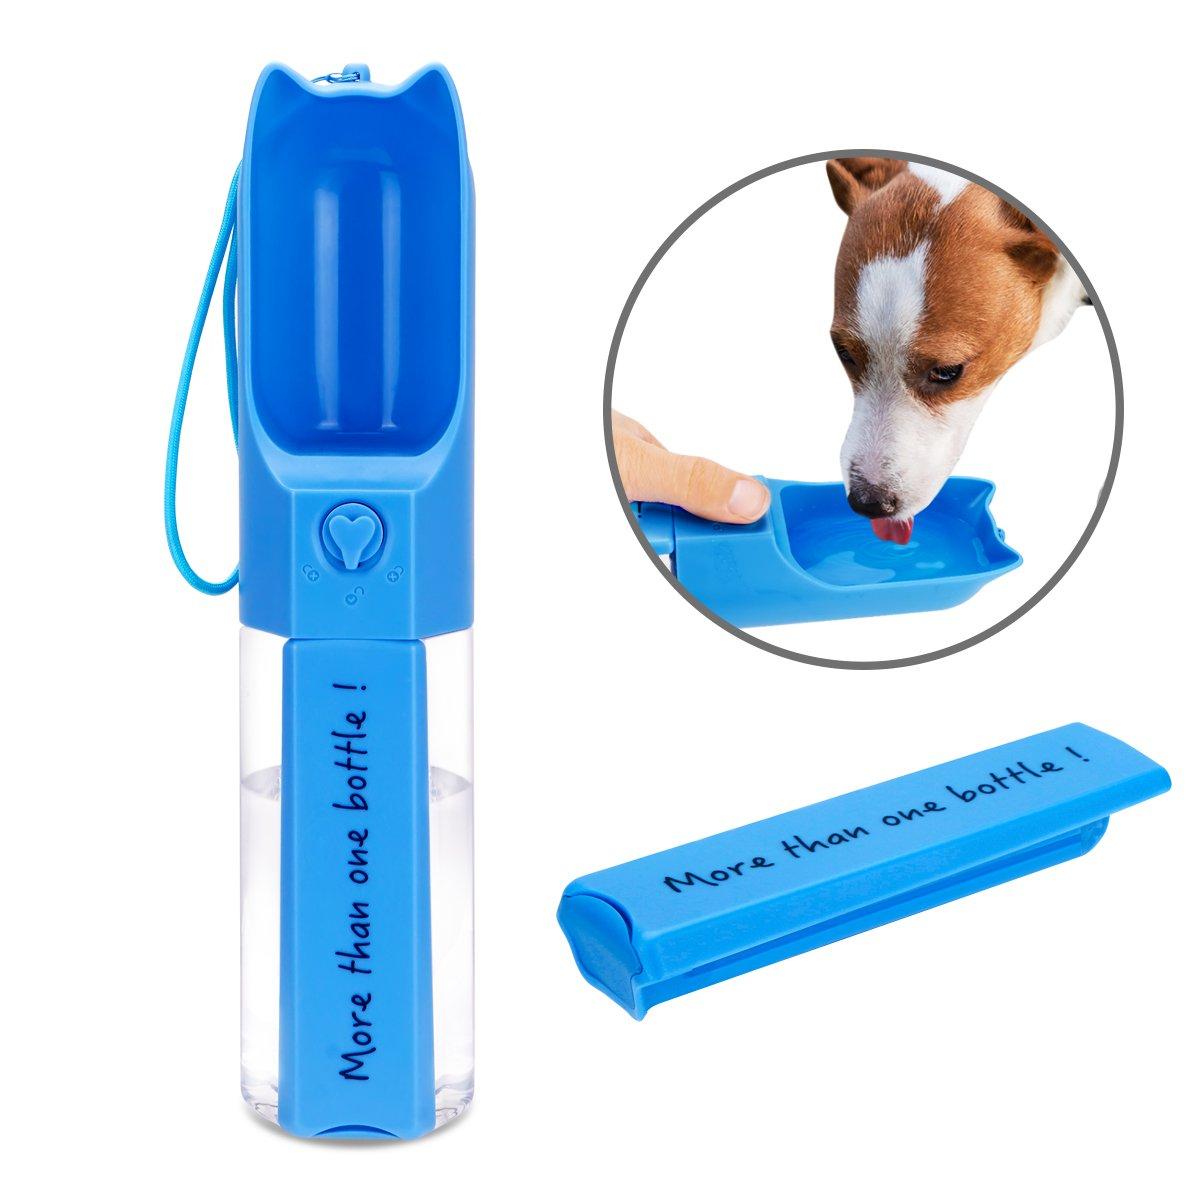 XUANRUS Dog Travel Water Bottle, Portable Pet Water Dispenser Drink Bottle Daily Walks, Hiking, Camping, Beach, BPA Free Plastic Pet Food Box … (Blue)